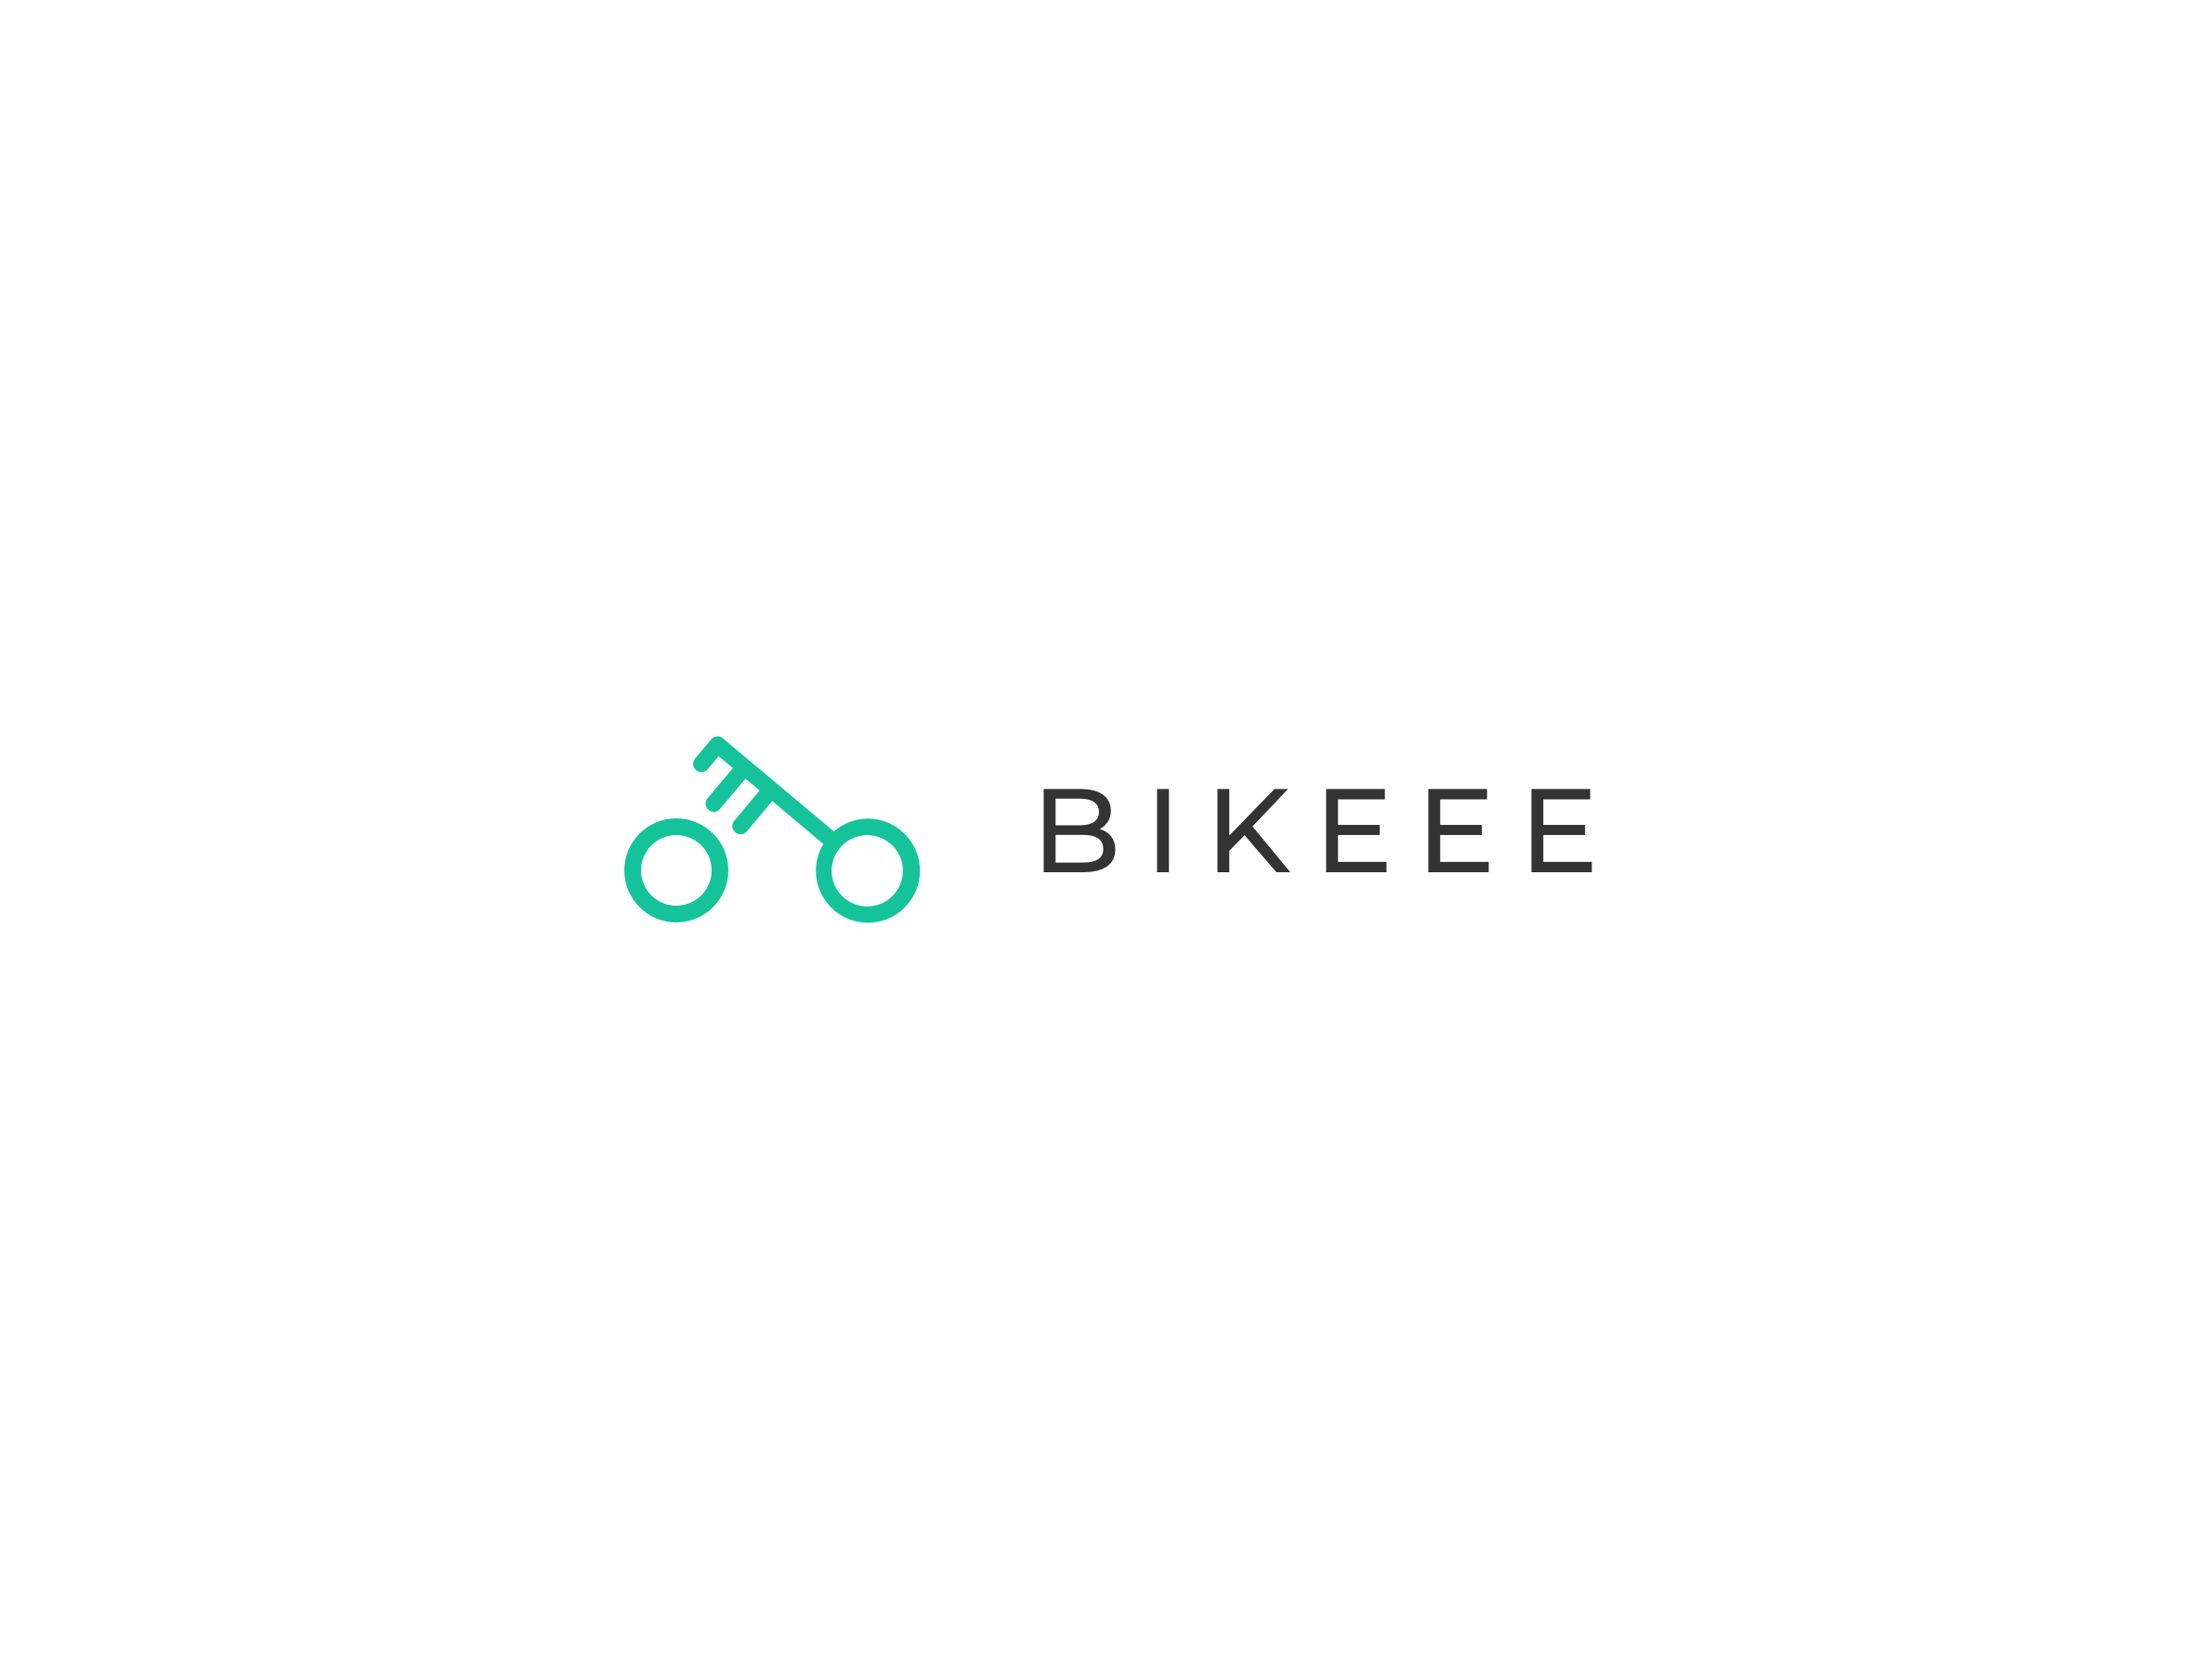 bikeee-logo